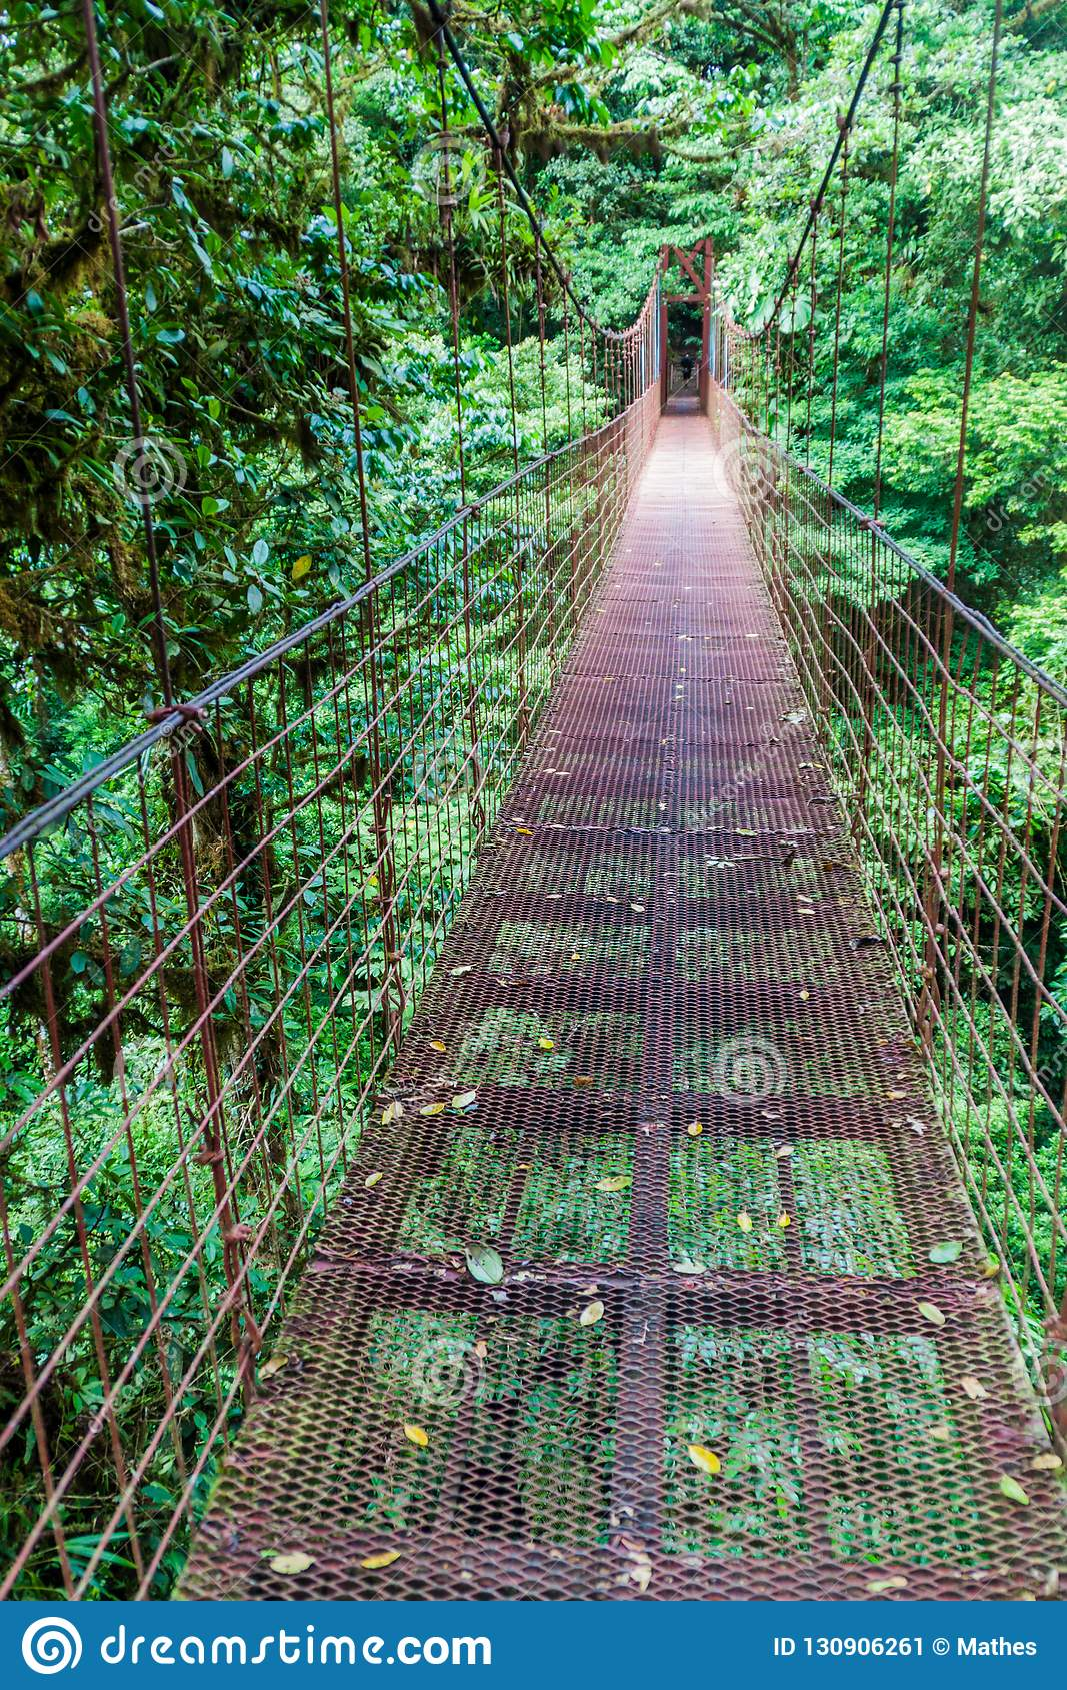 Suspension bridge in the cloud forest of Reserva Biologica Bosque Nuboso Monteverde, Costa Ri